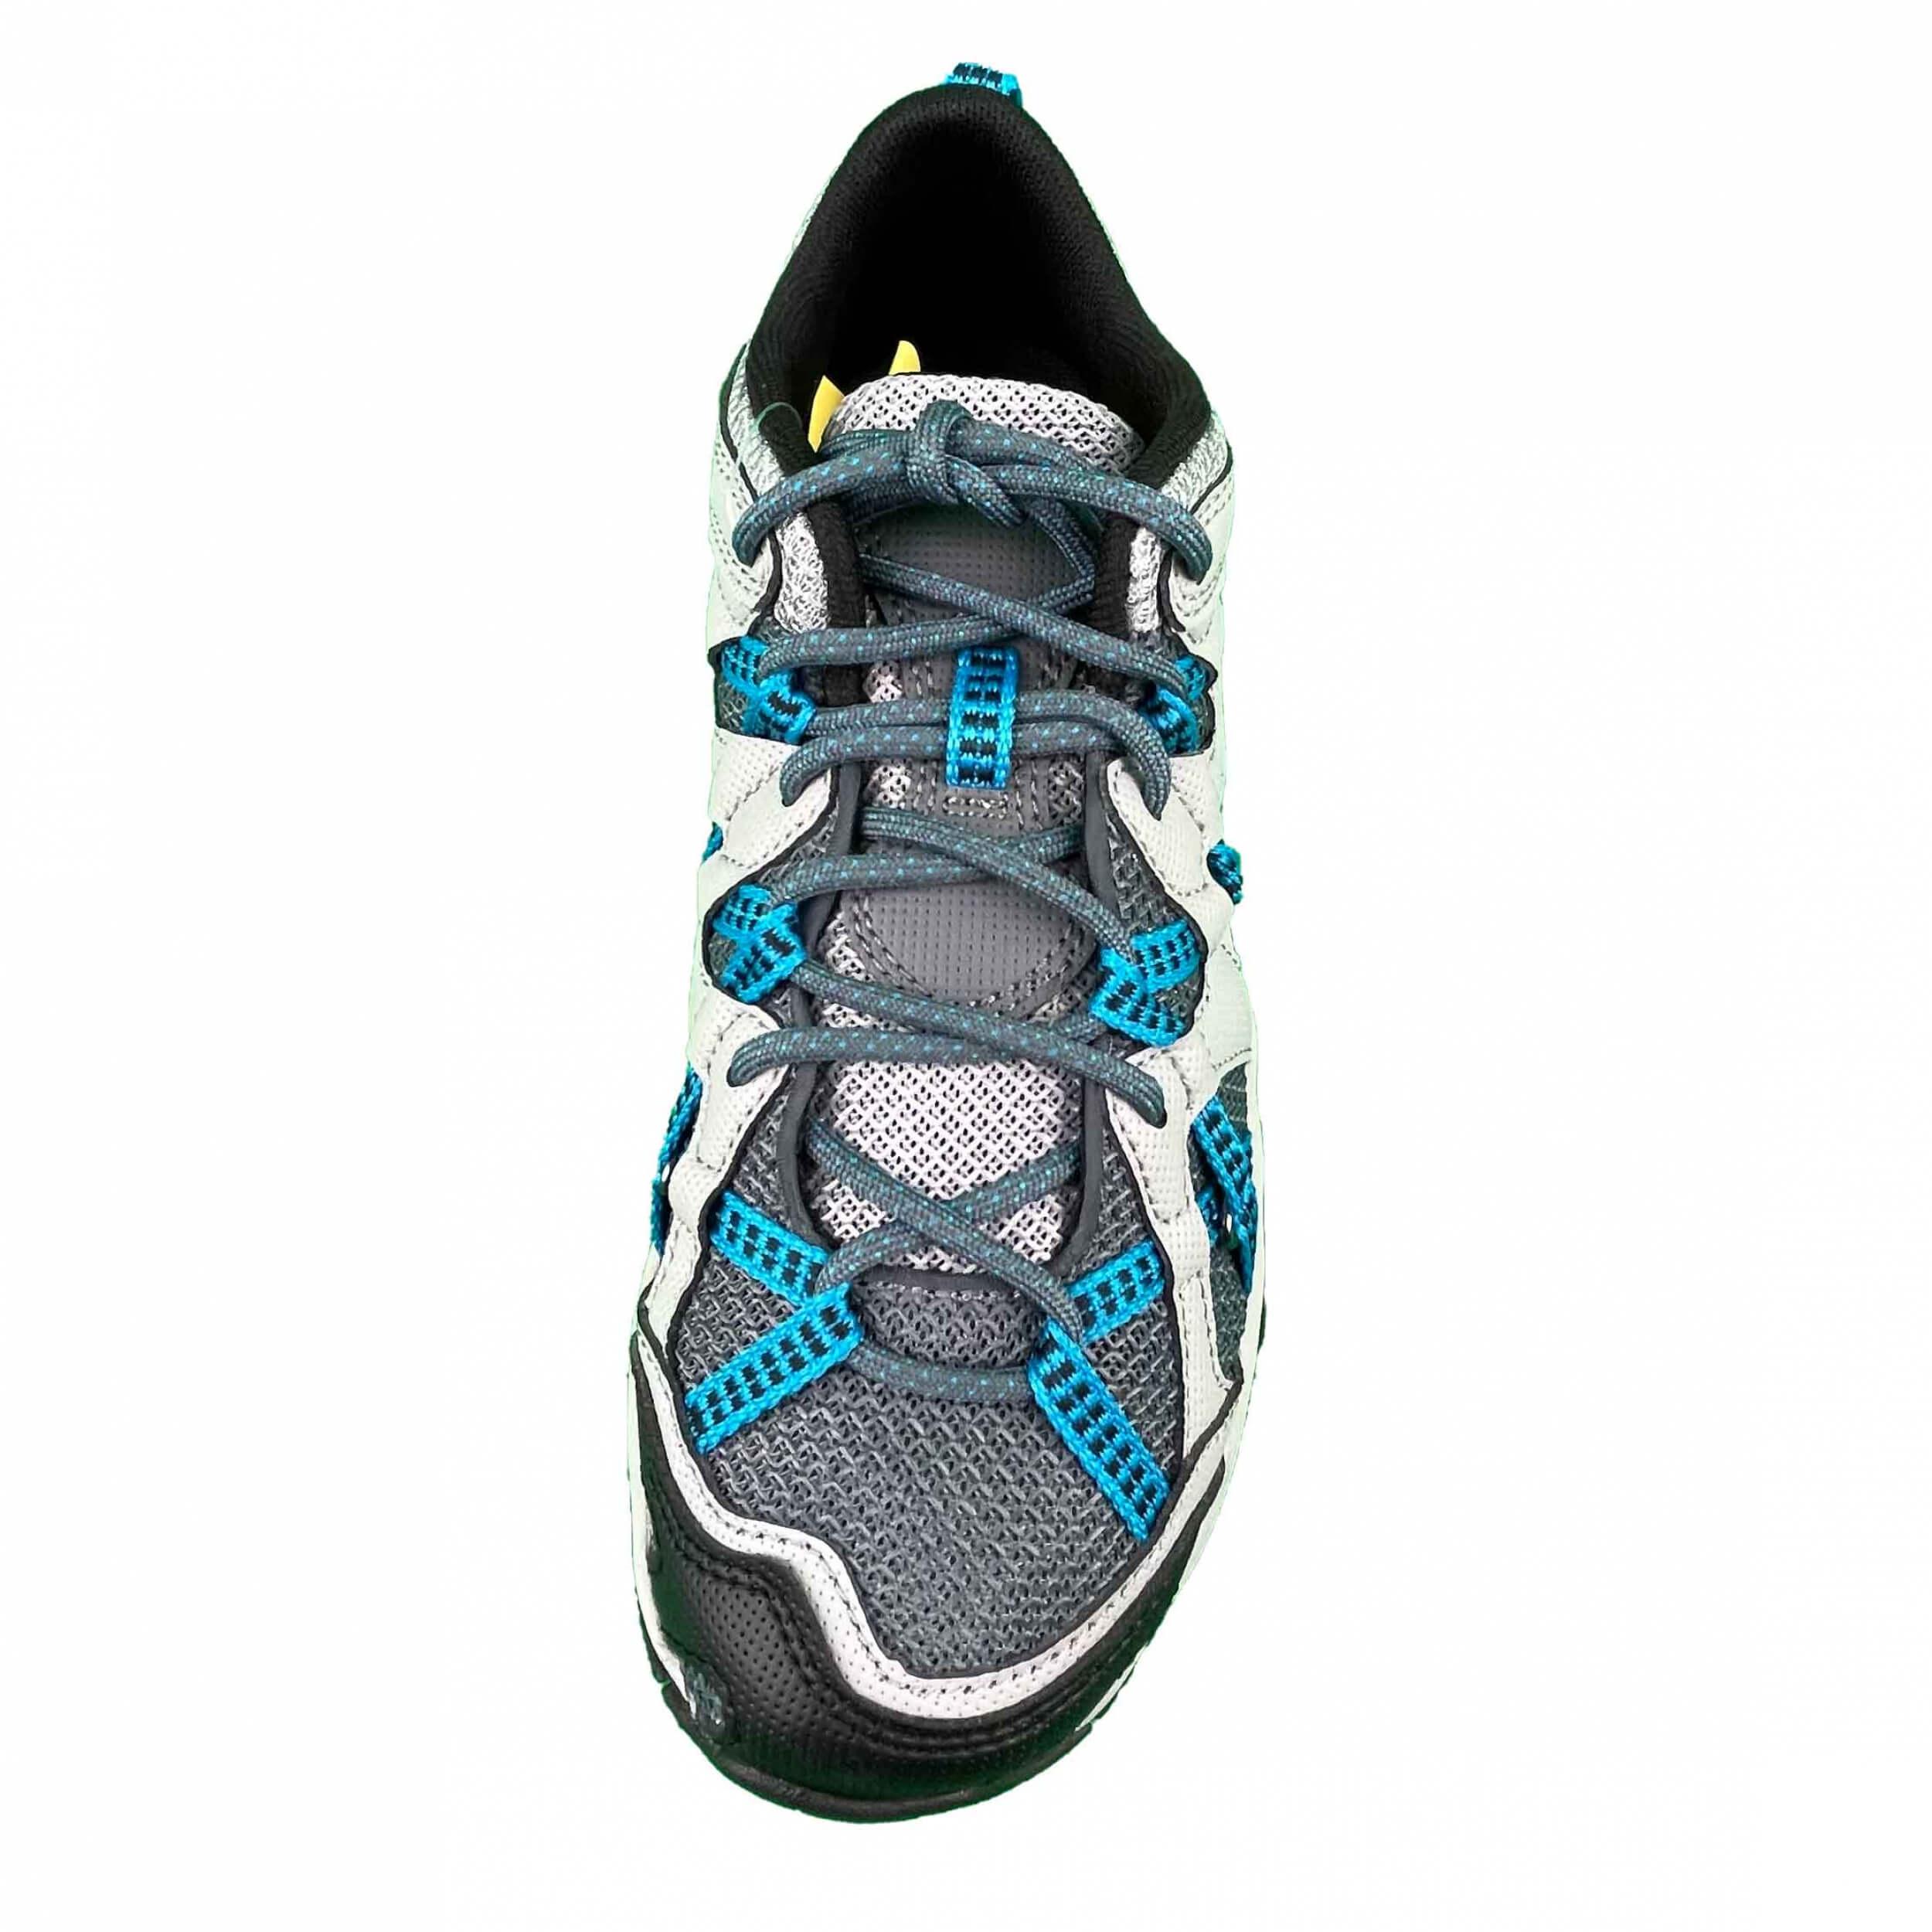 Merrell Damen Schuhe Waterpro Ultrasport 2 W J036150 grau